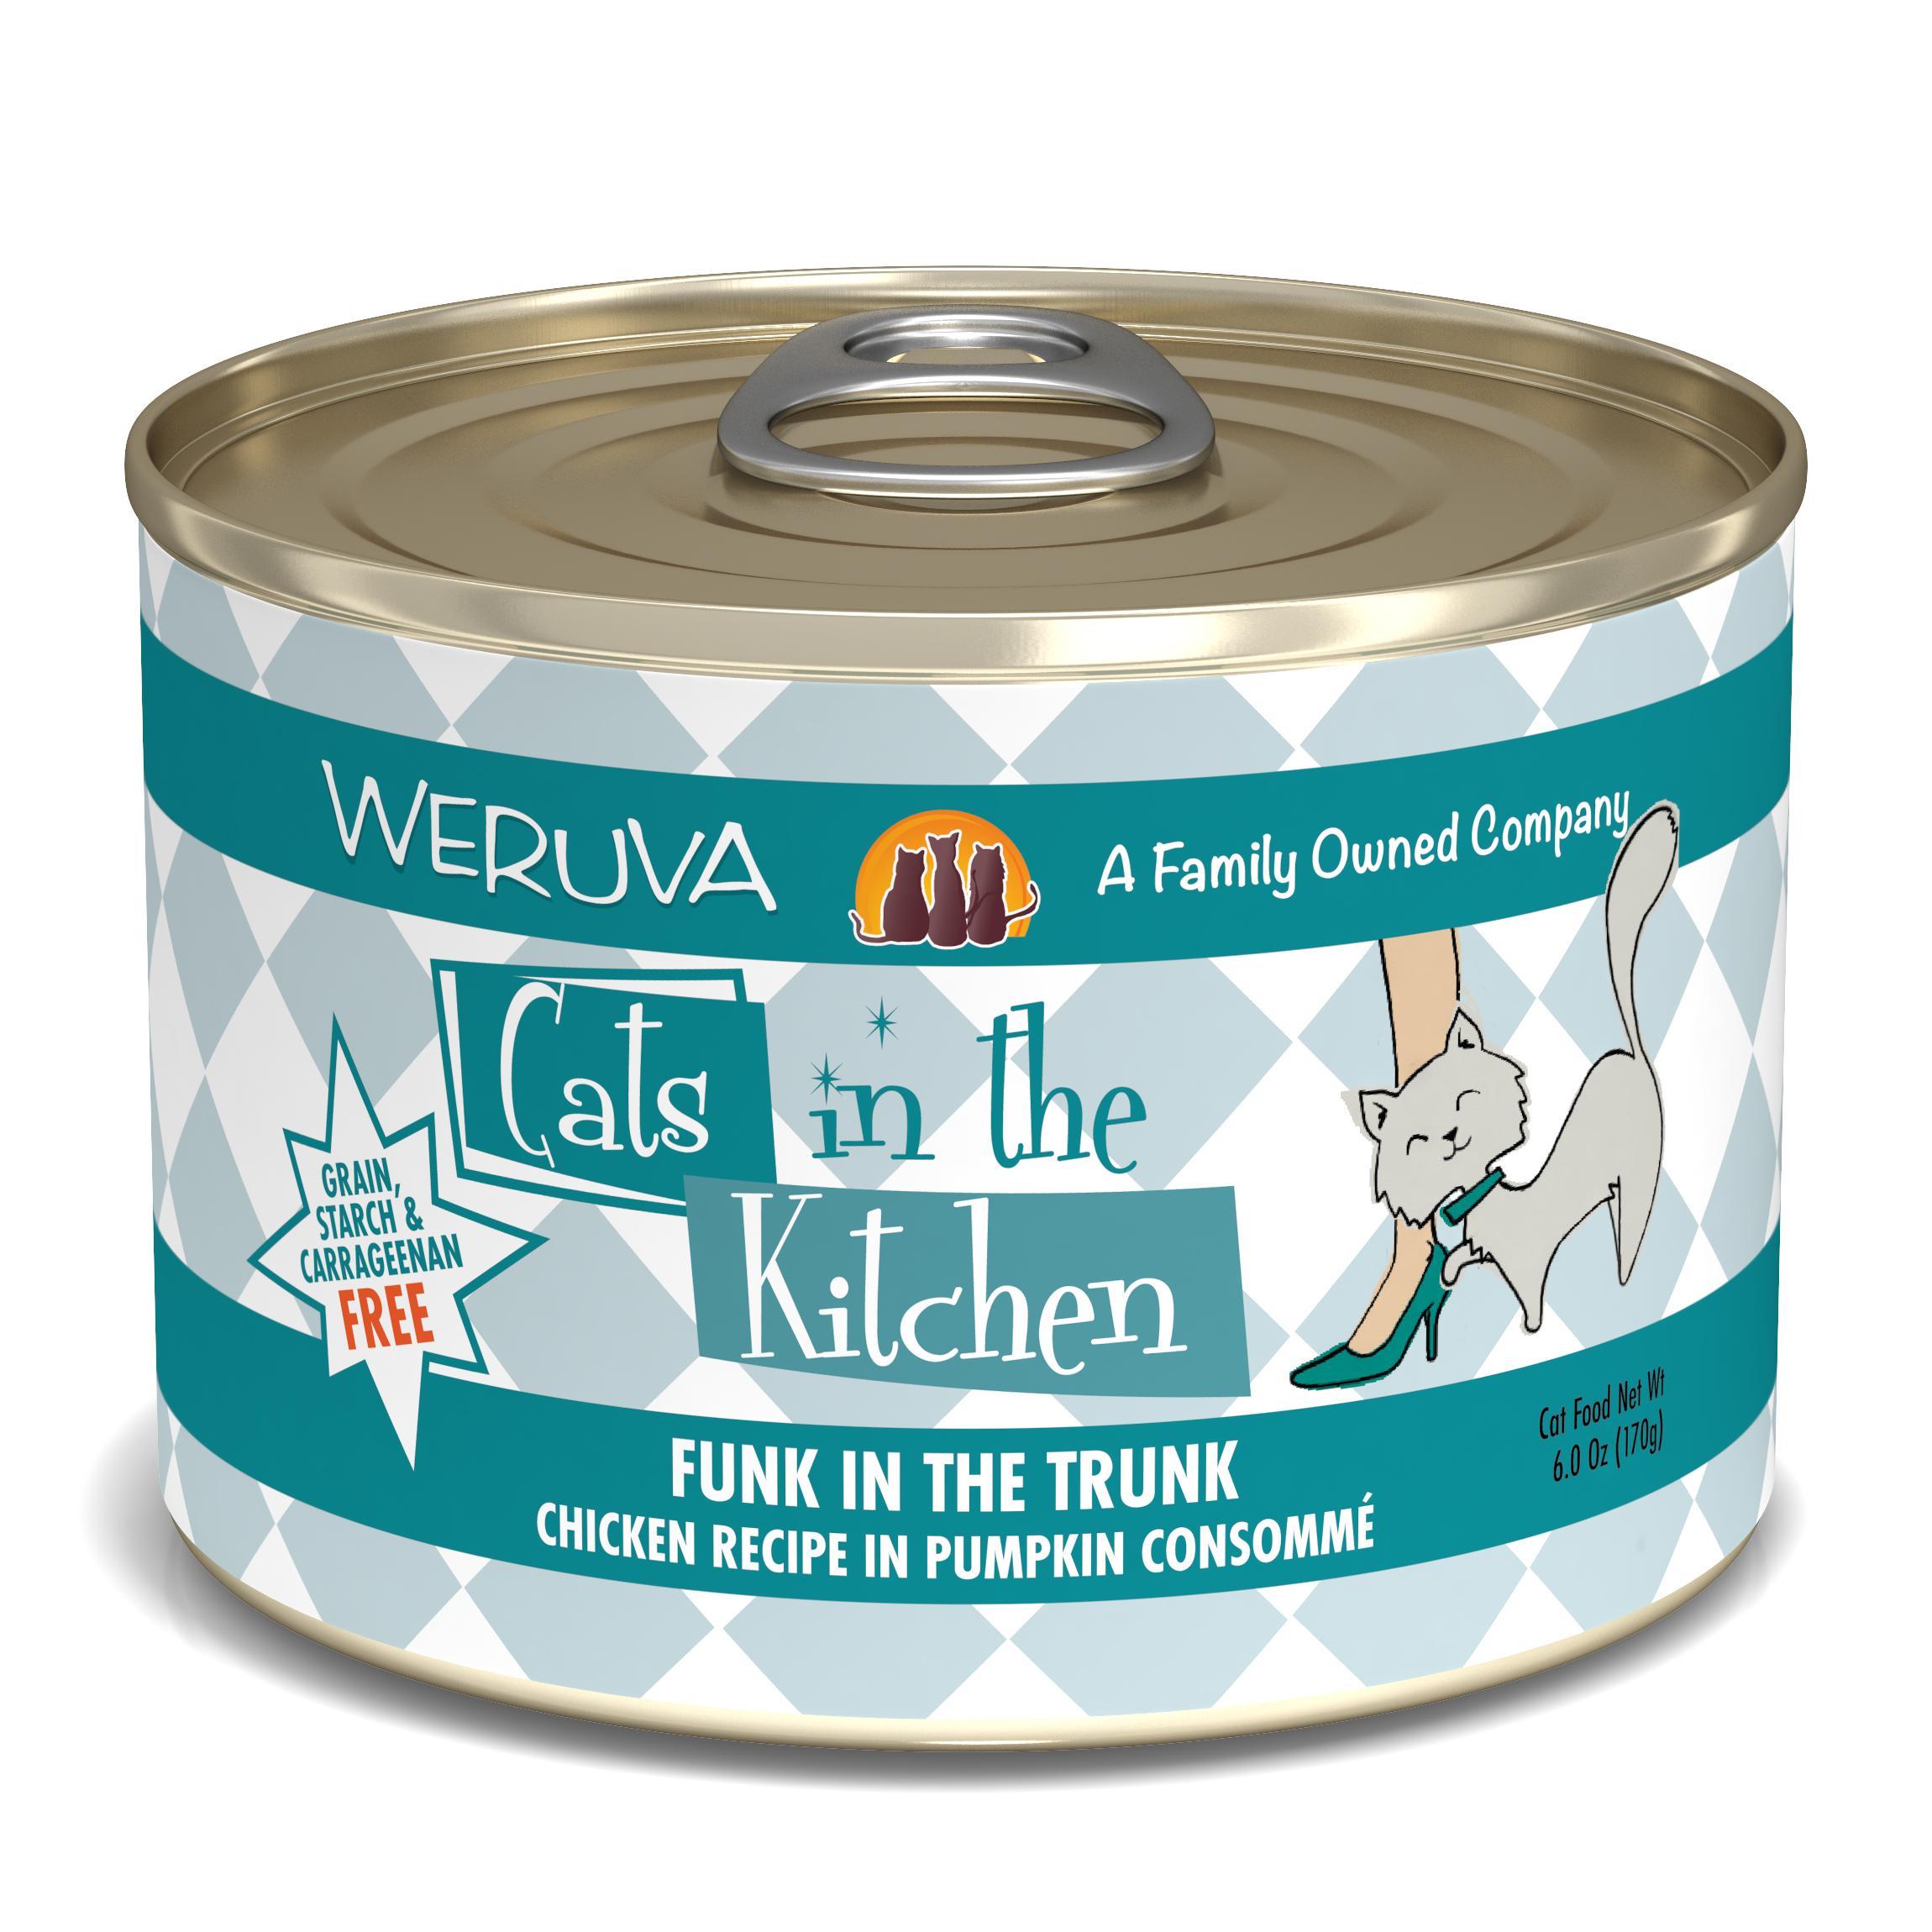 Weruva Cats in the Kitchen Funk In The Trunk Chicken in Pumpkin Consomme Grain-Free Wet Cat Food, 6-oz